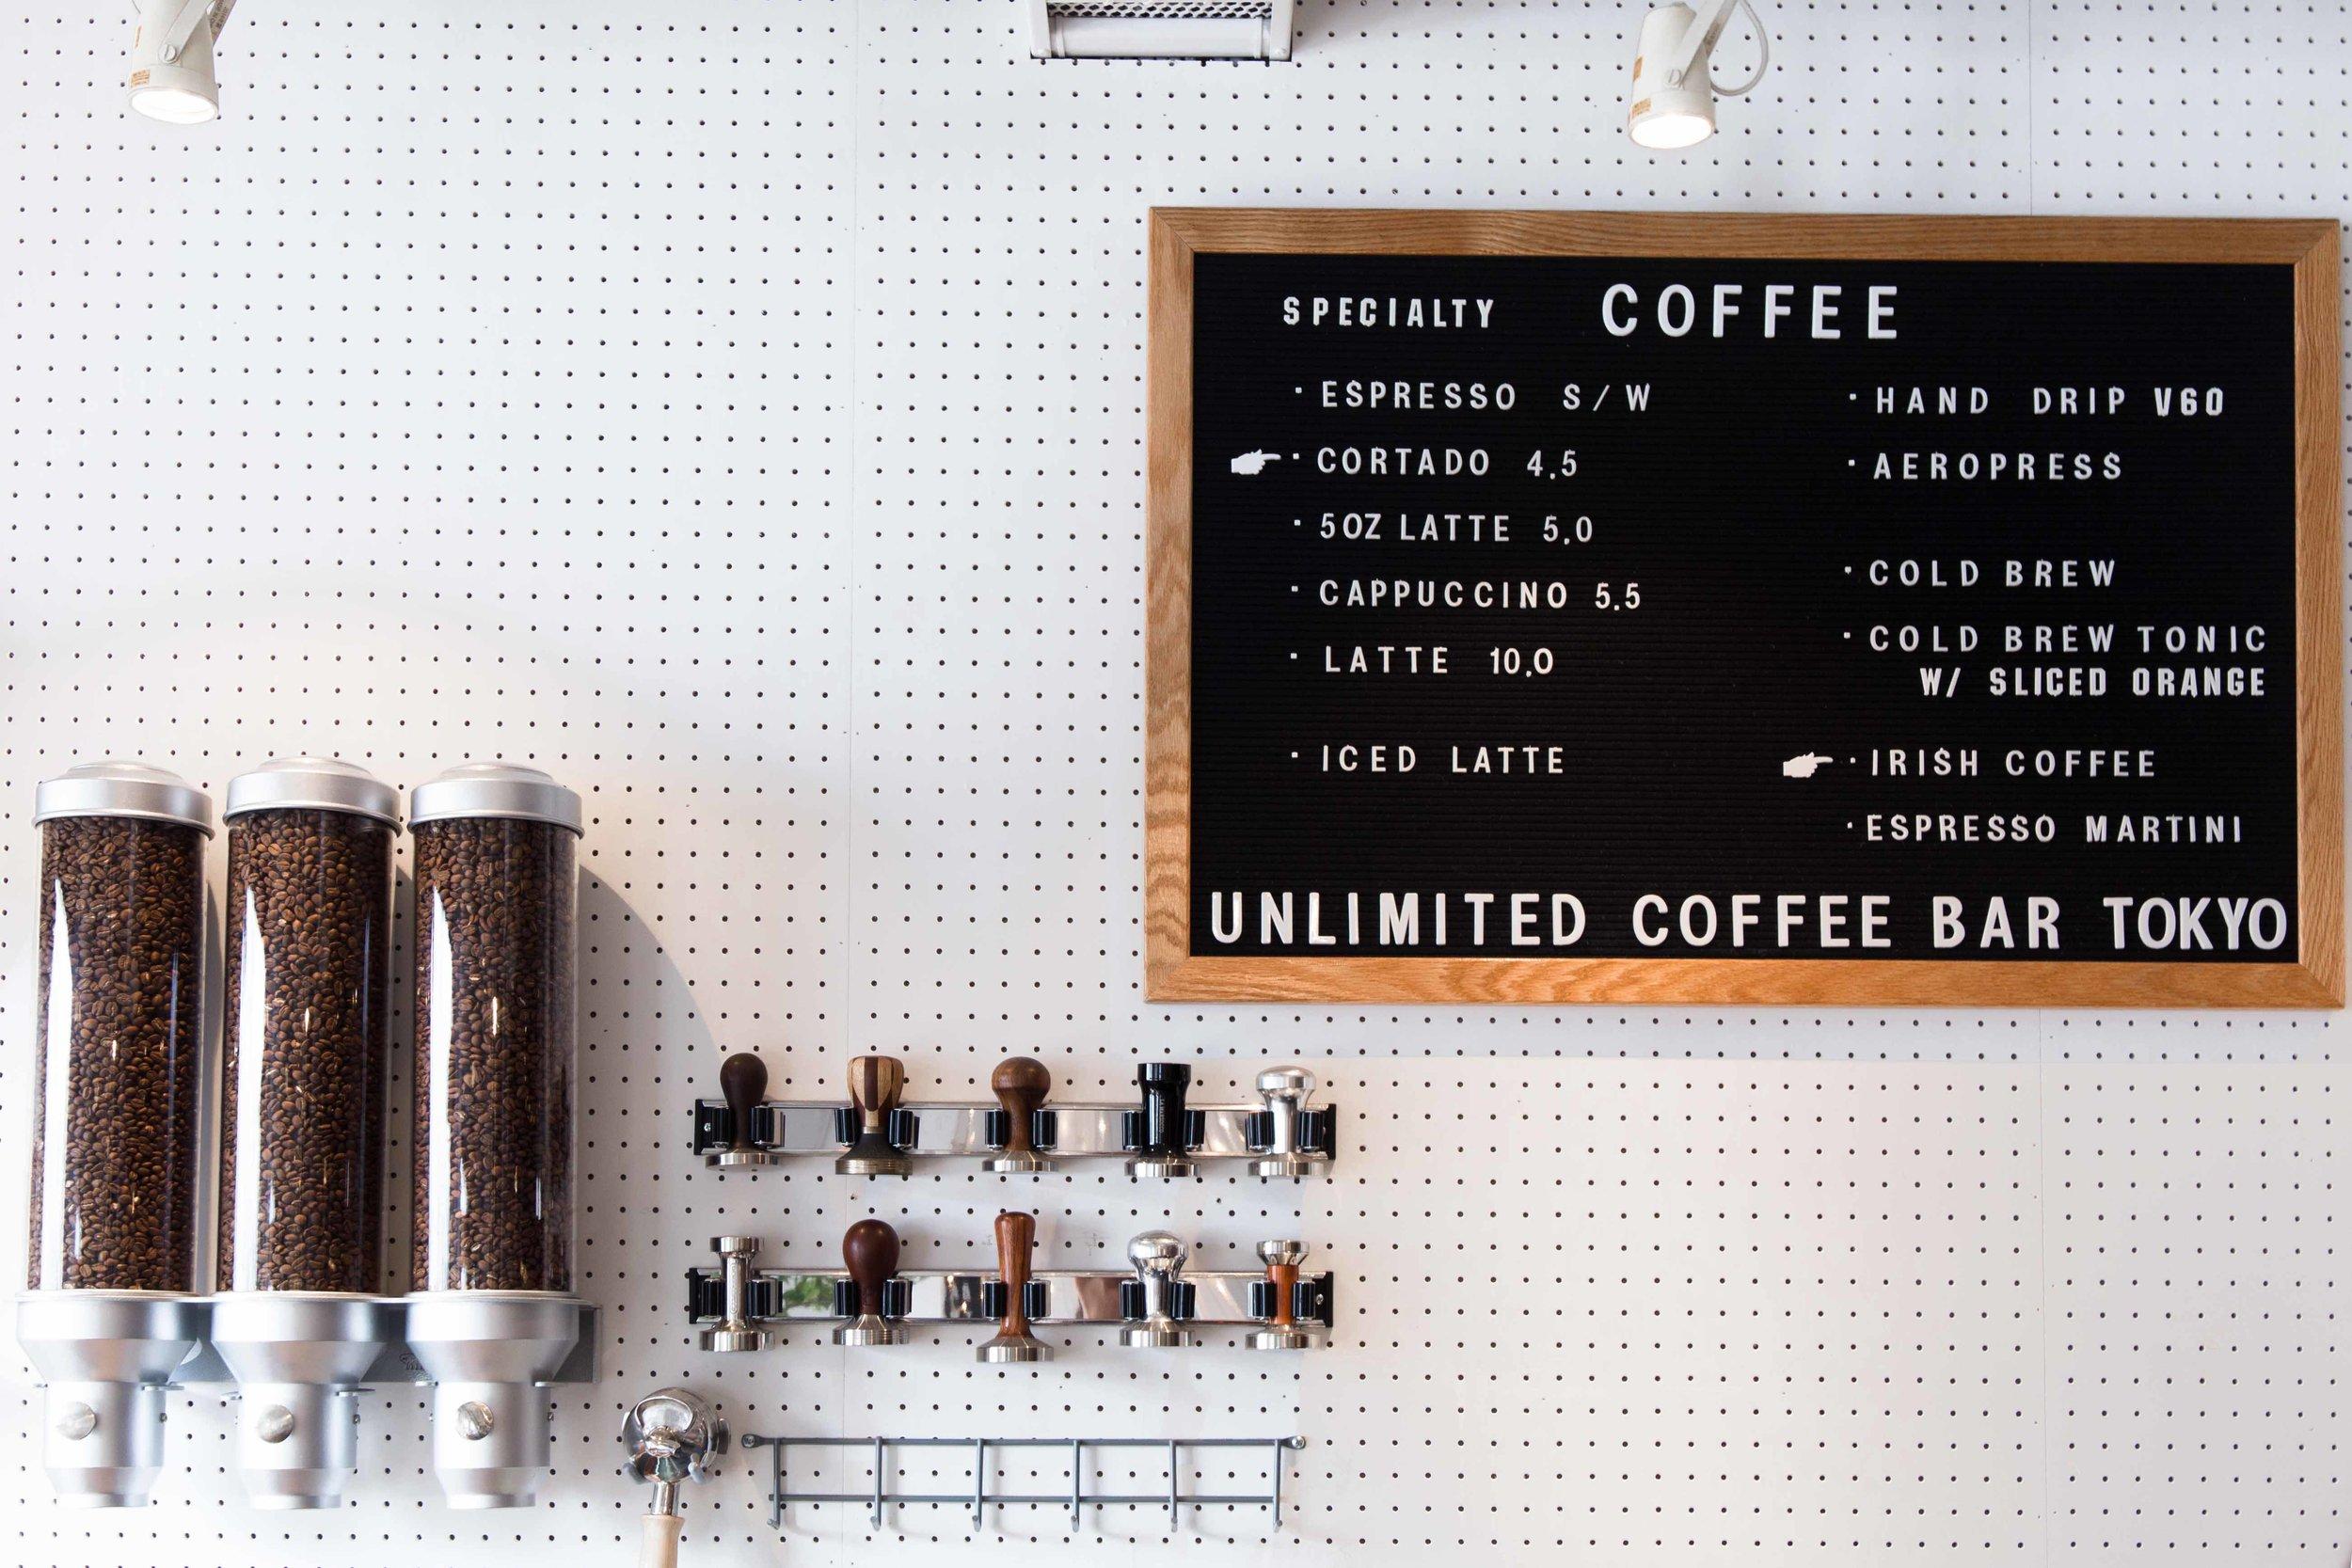 Tokyo Unlimited Specialty Coffee Shop